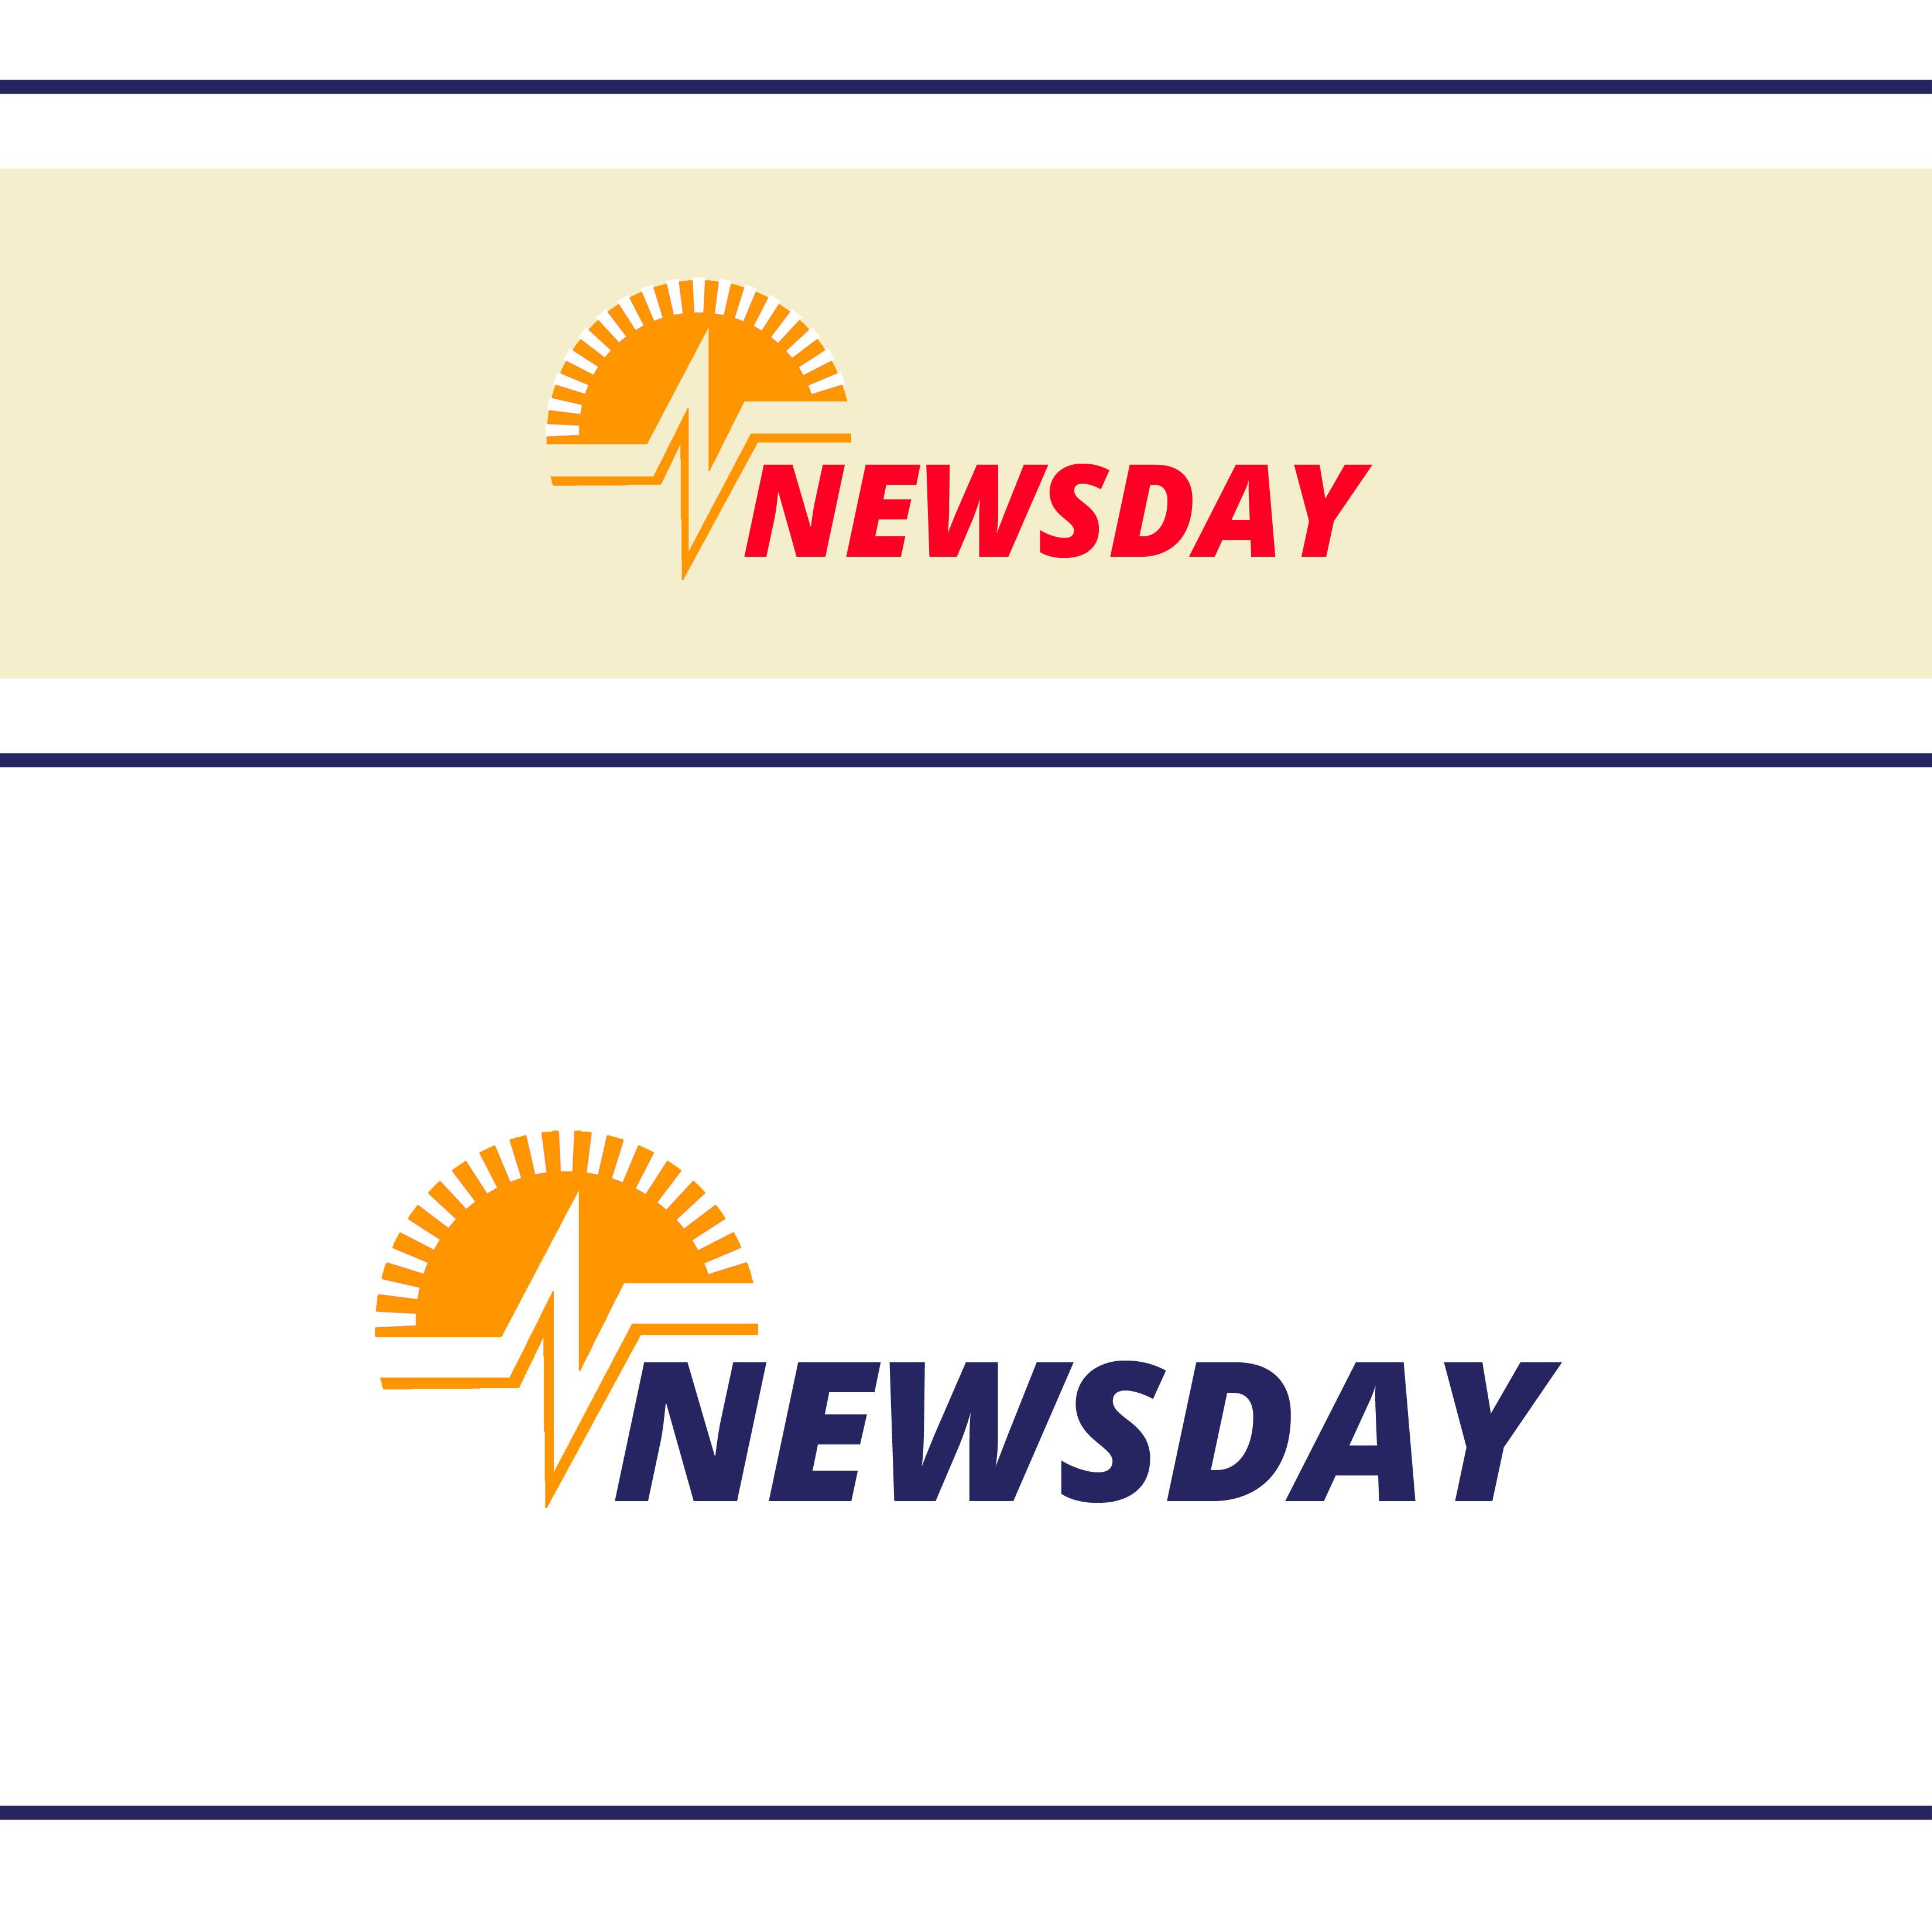 Logo Design by Allan Esclamado - Entry No. 12 in the Logo Design Contest Artistic Logo Design for Newsday.